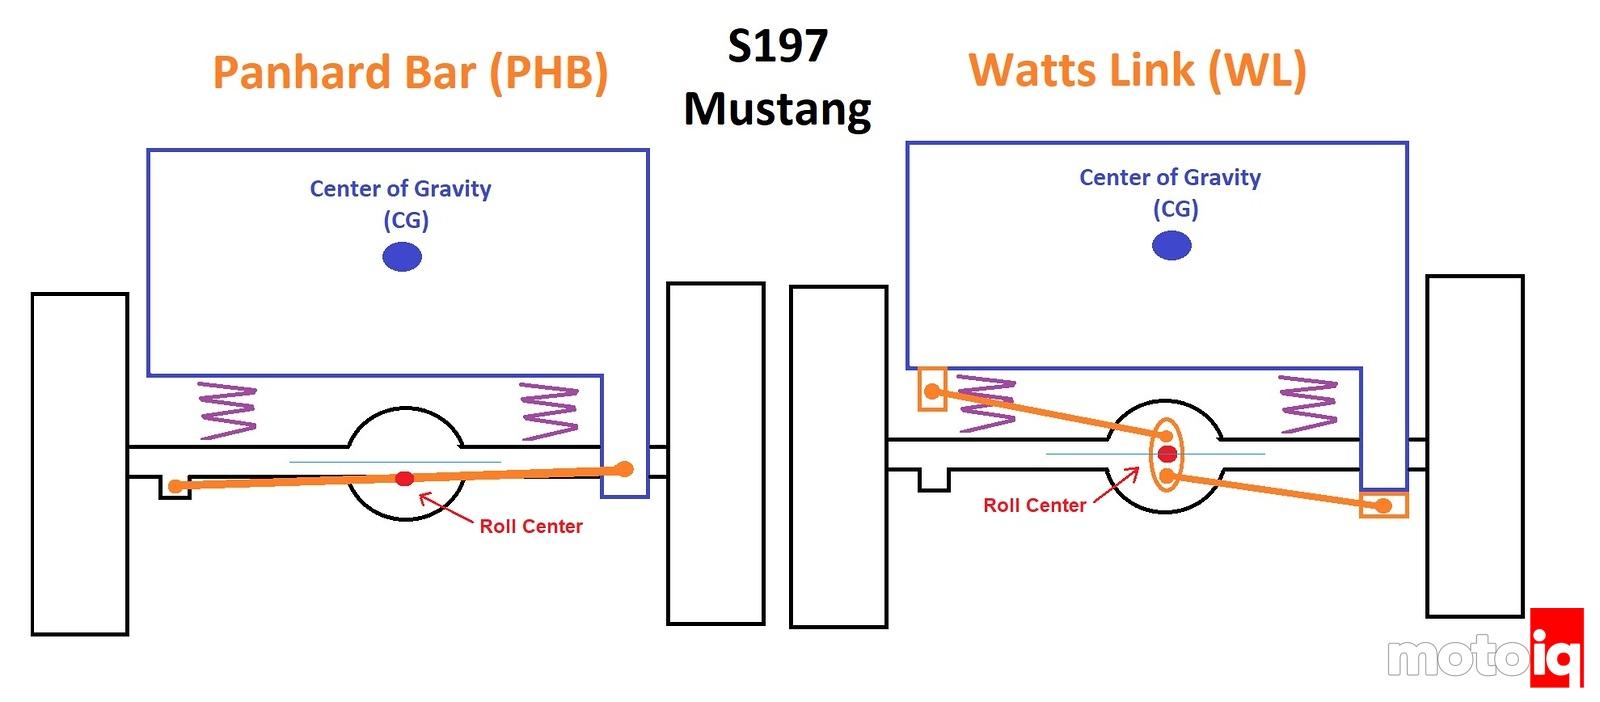 S197 Mustang Panhard Bar vs Watts Link